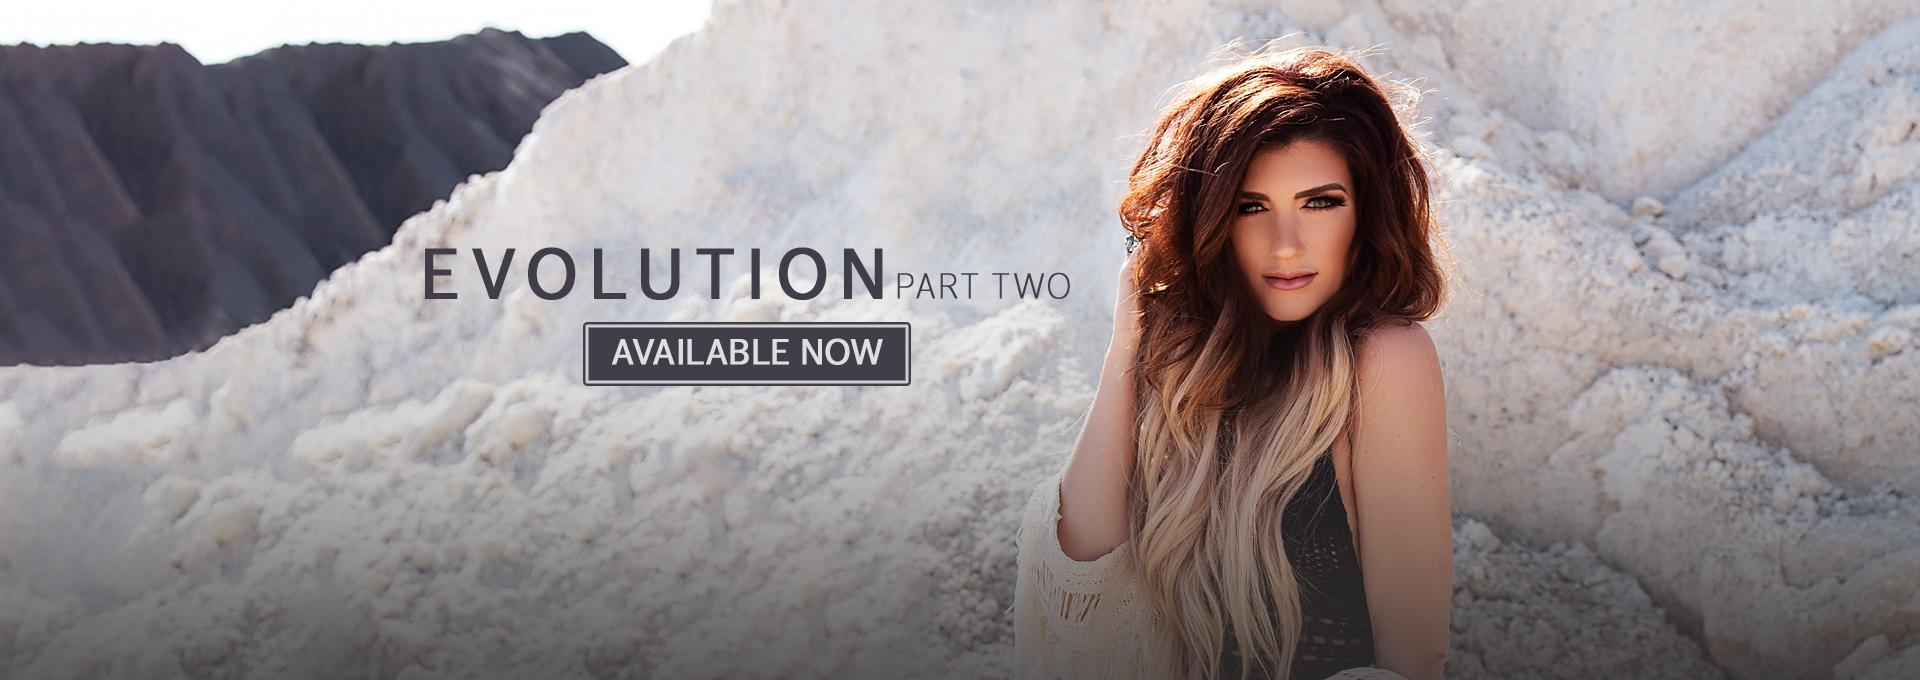 LAevolution2_banner.jpg